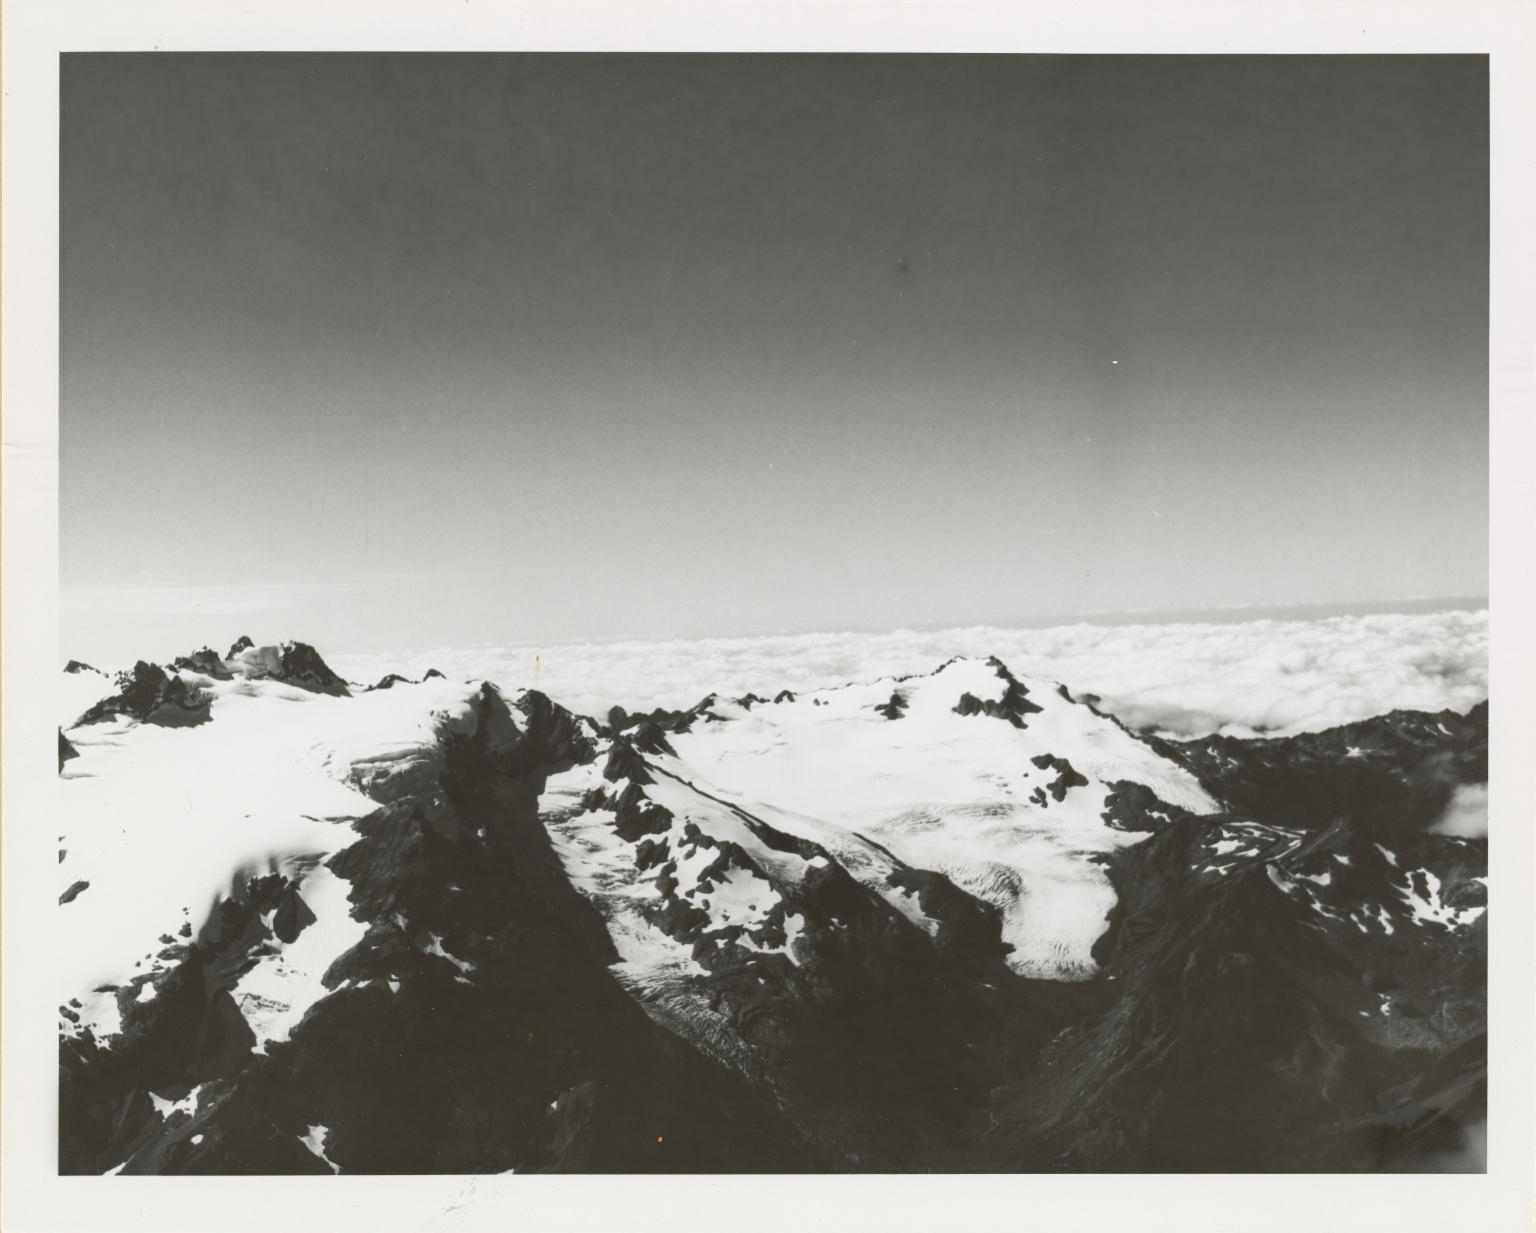 White Glacier and Mud Glacier, Washington